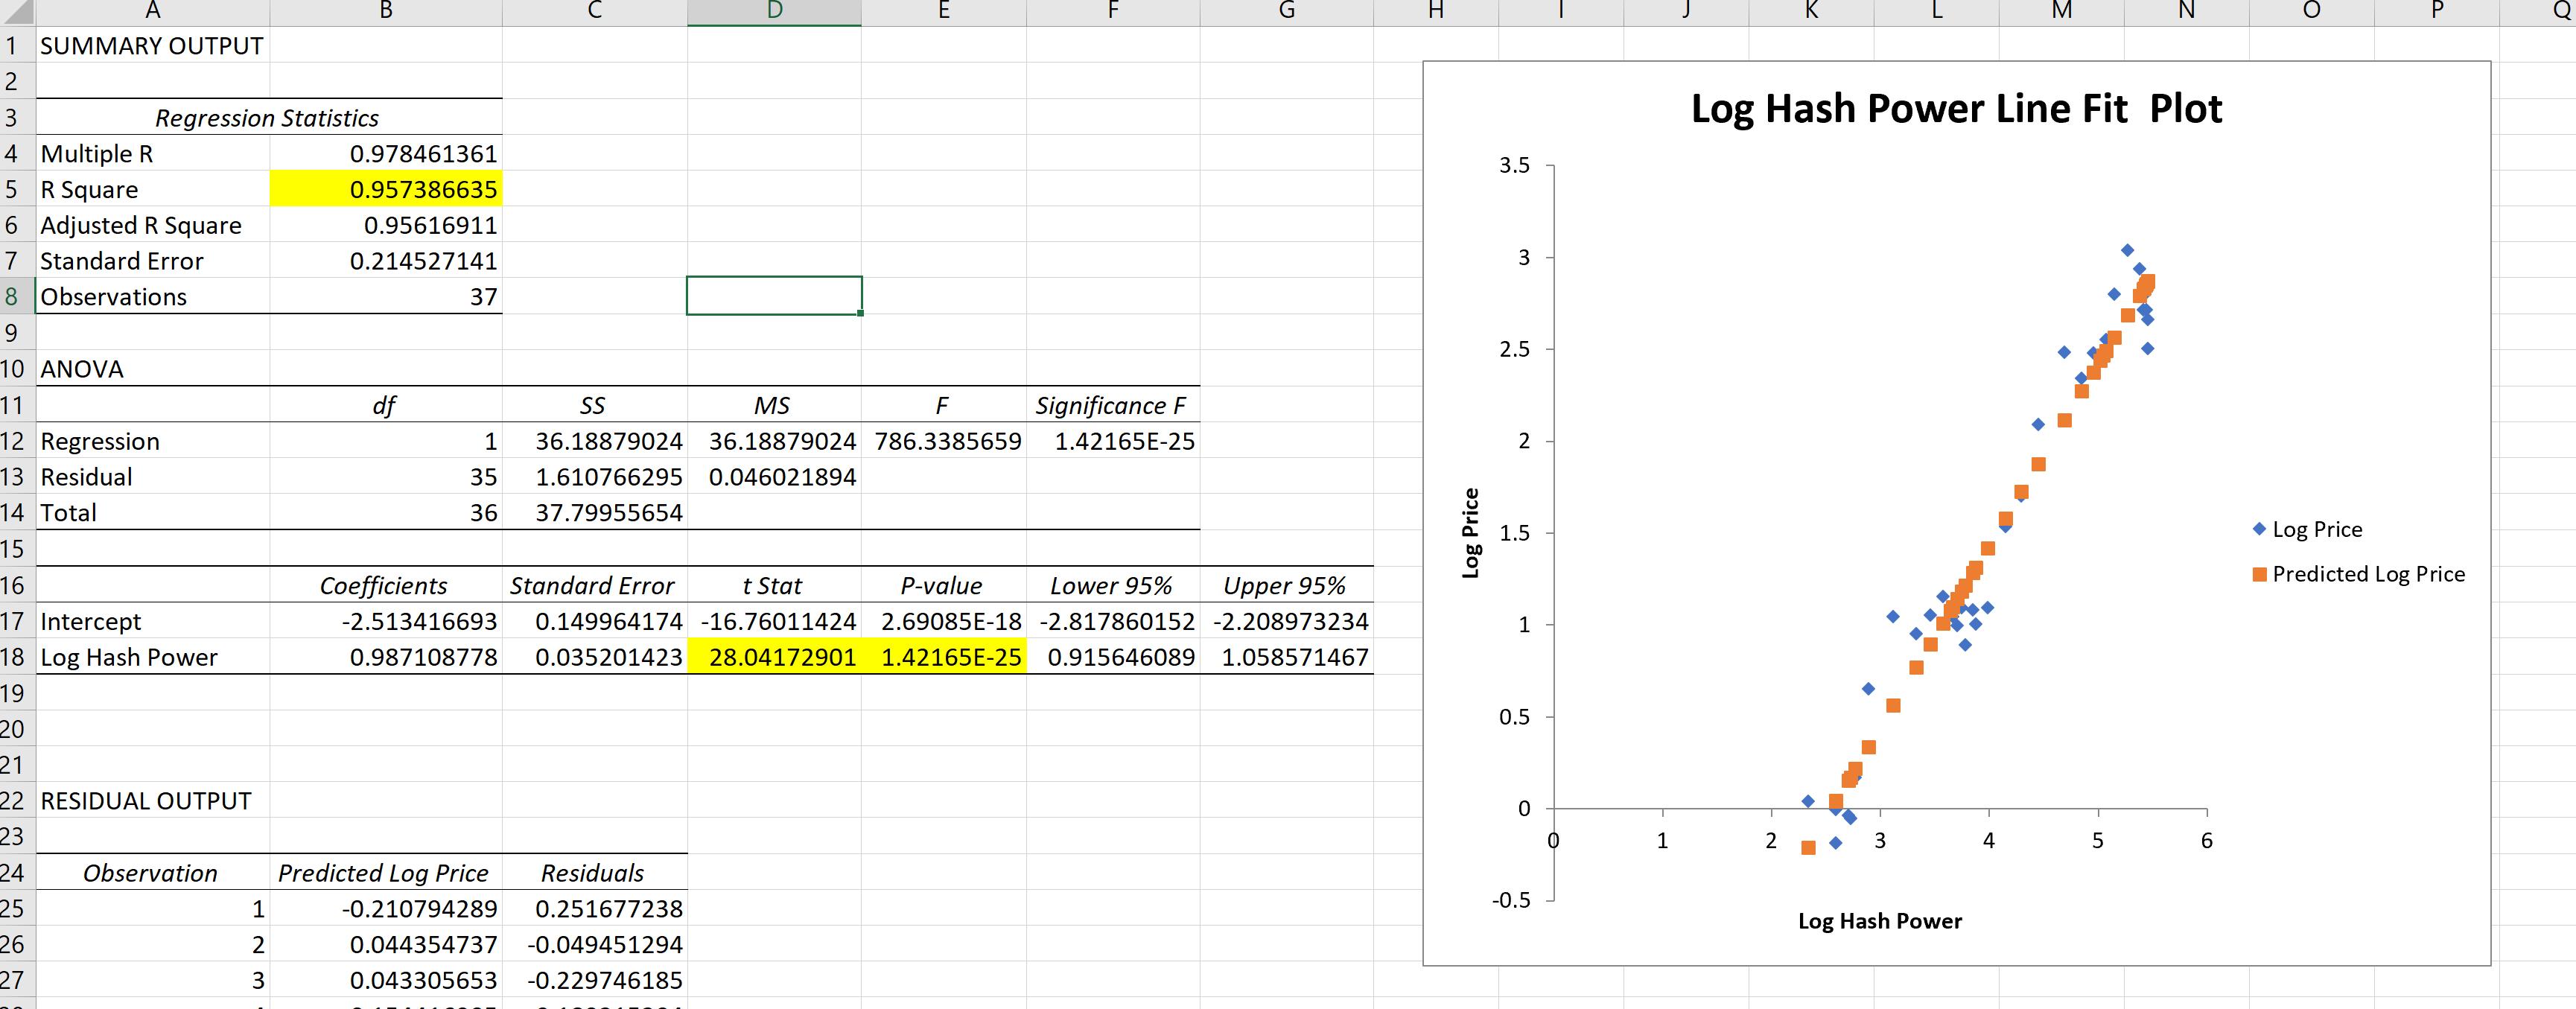 Bitmex Excel Sheet